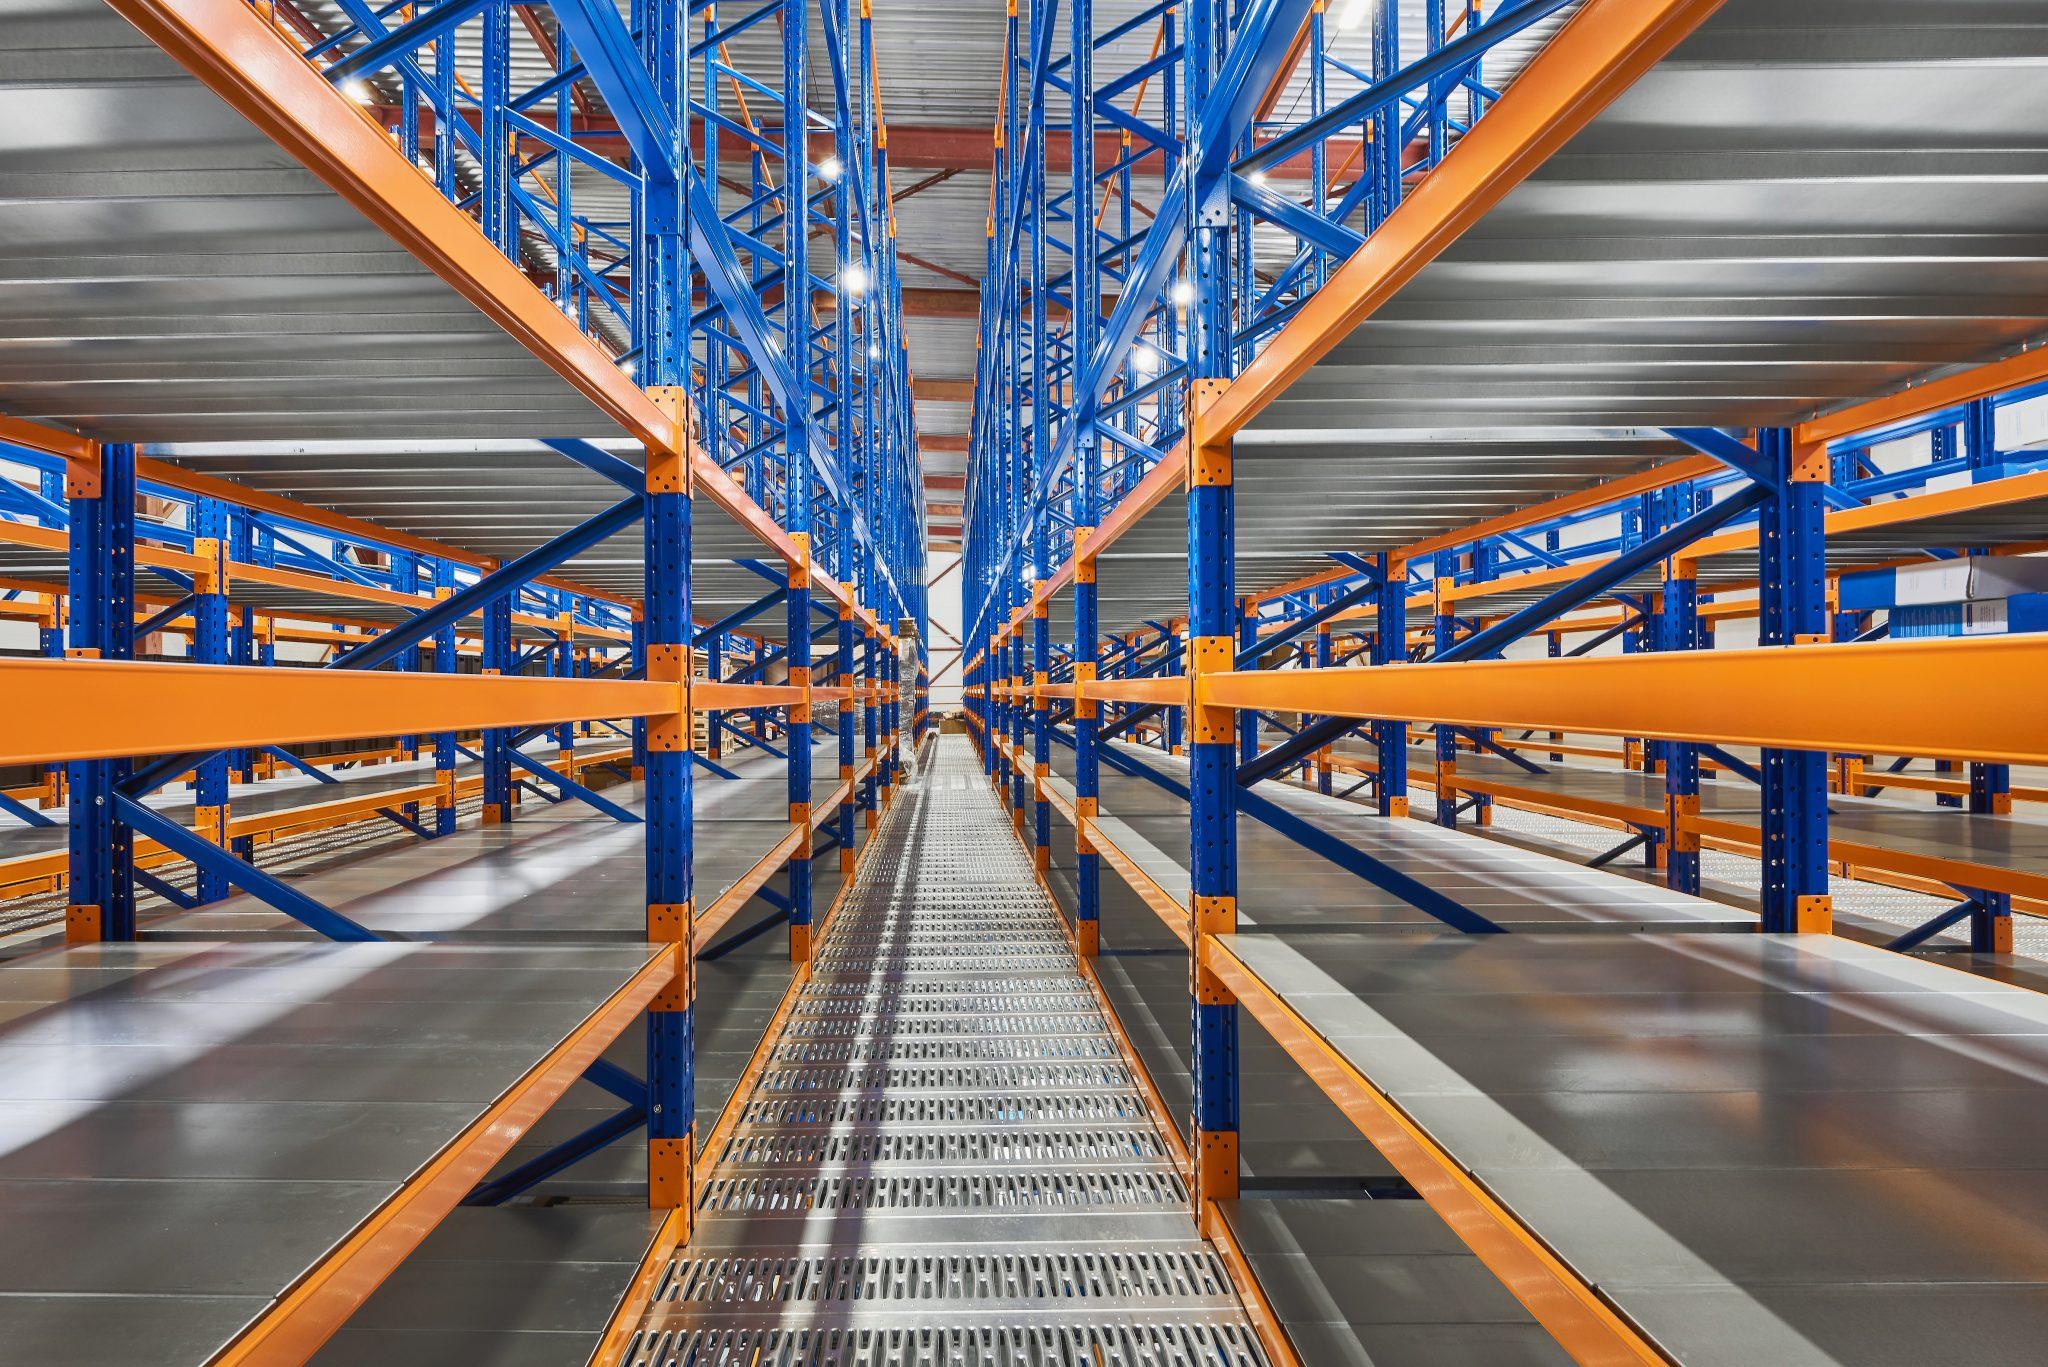 Empty shelves in new distribution warehouse. Metal equipment for storage, racks blue orange, pallet racking system